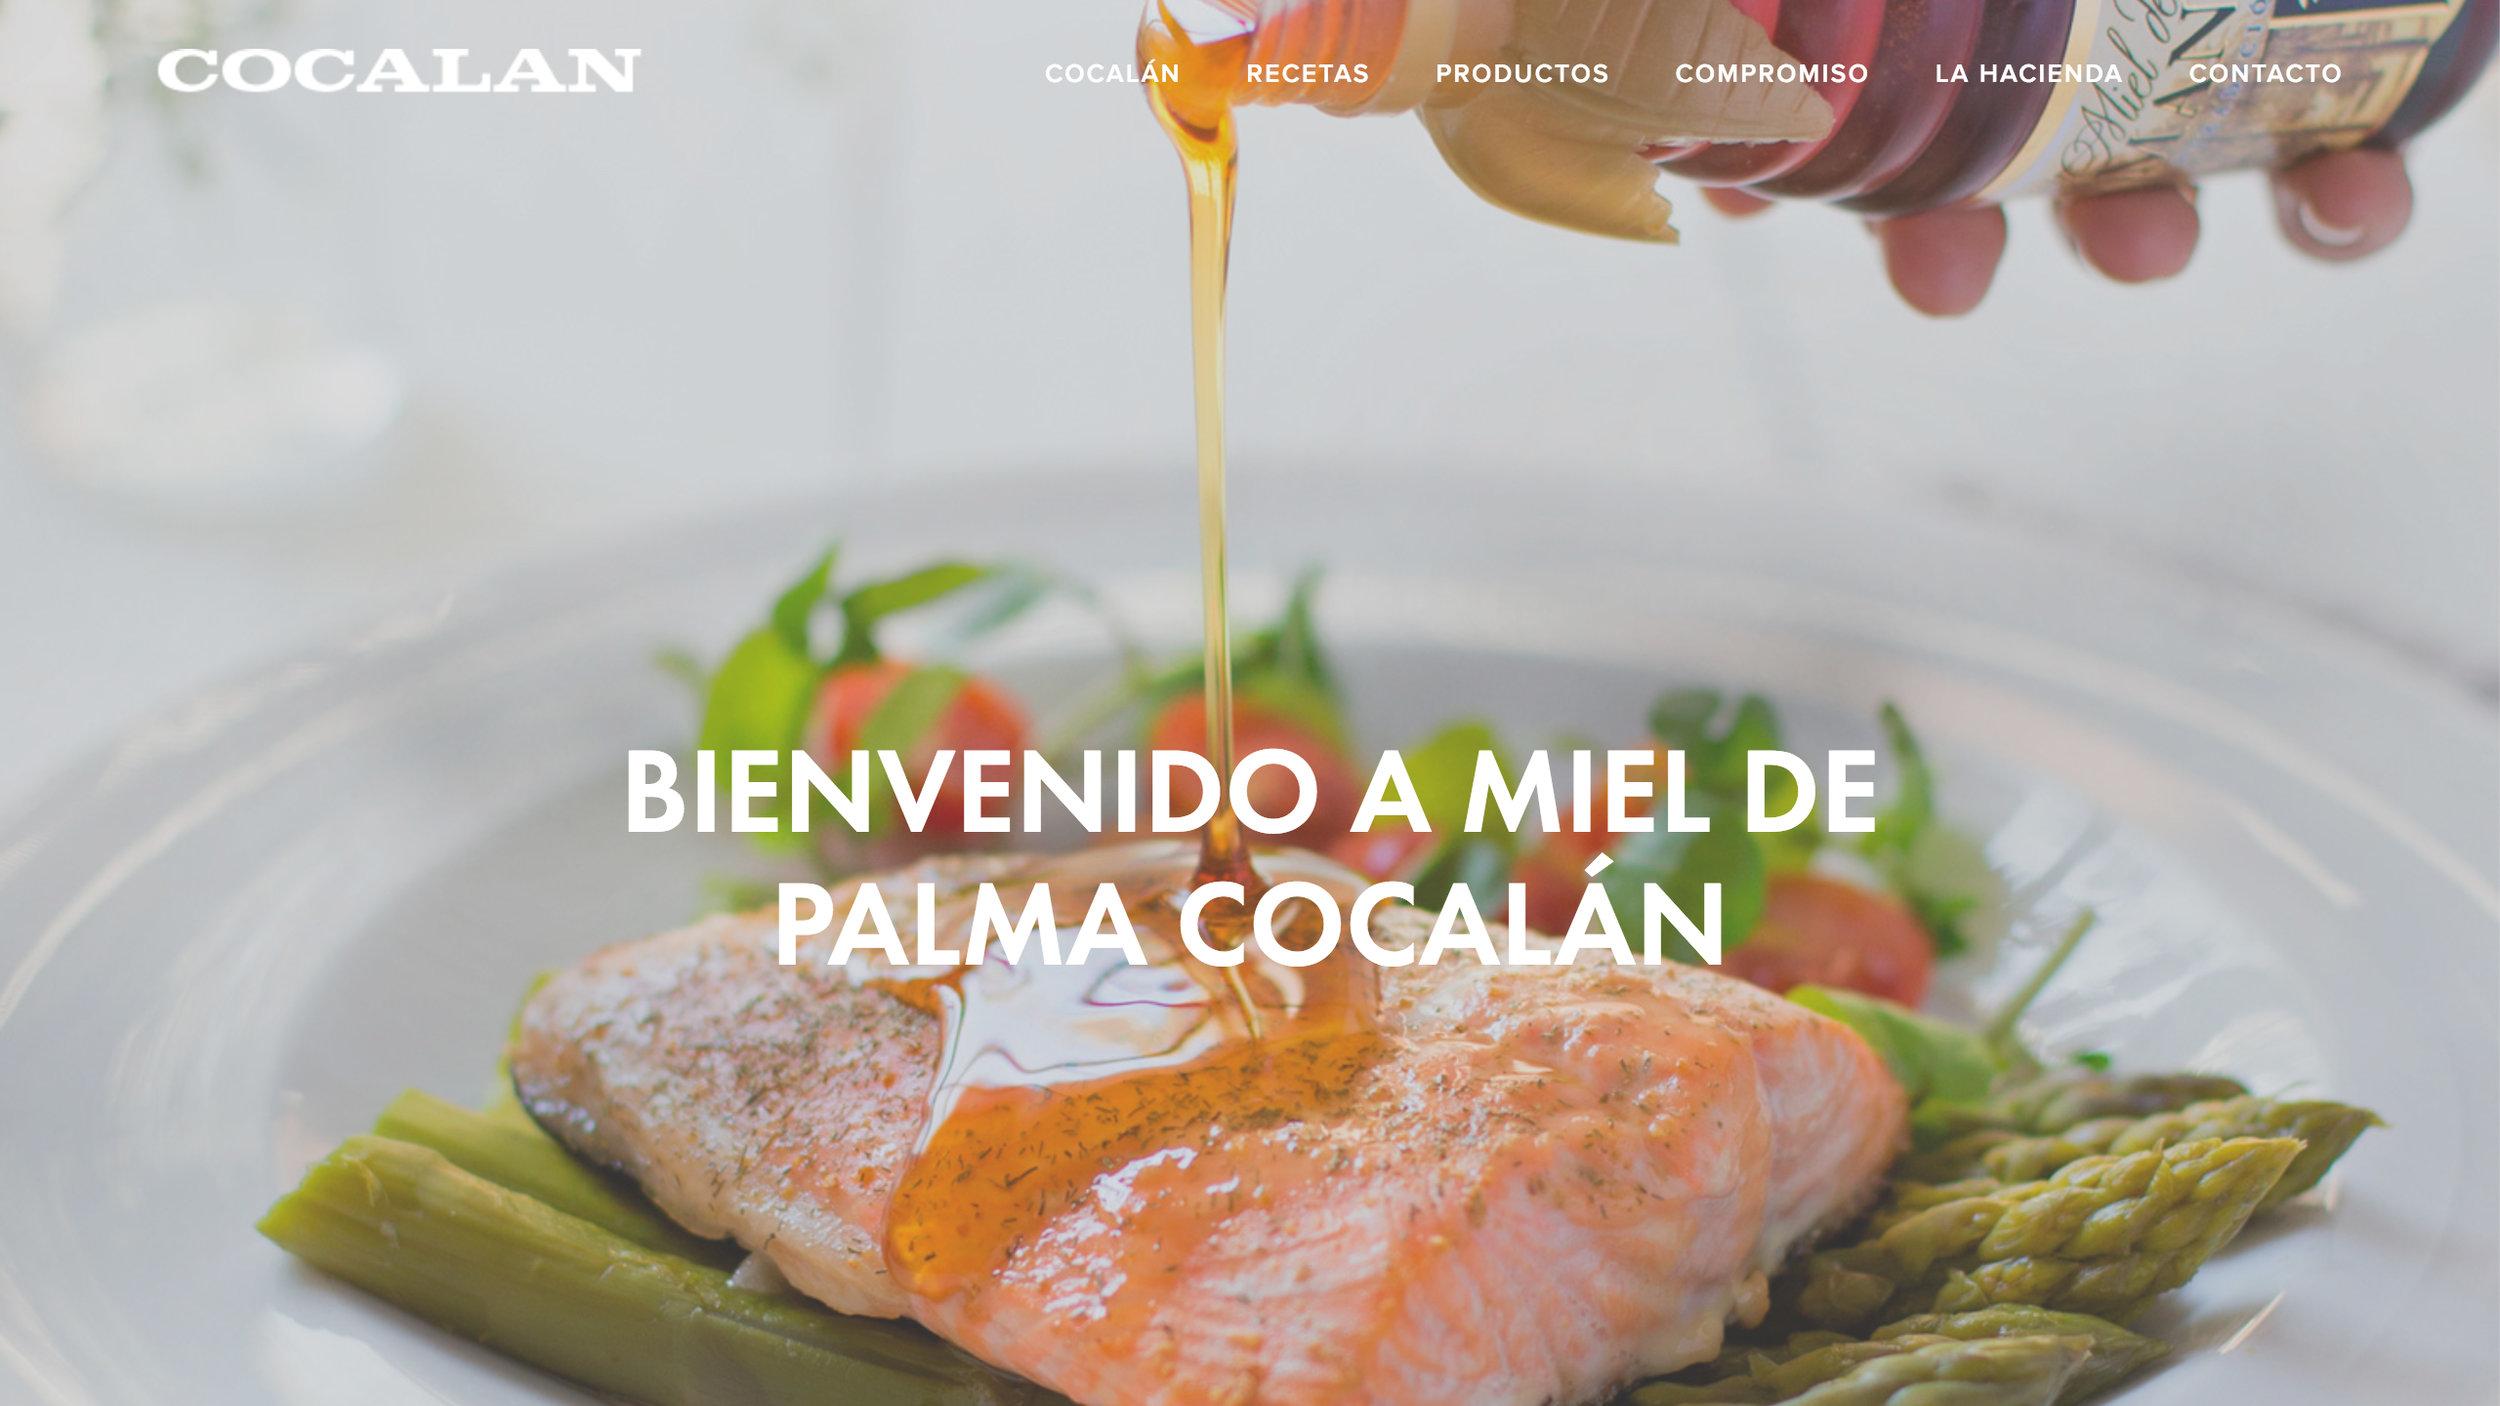 web-cocalan.jpg